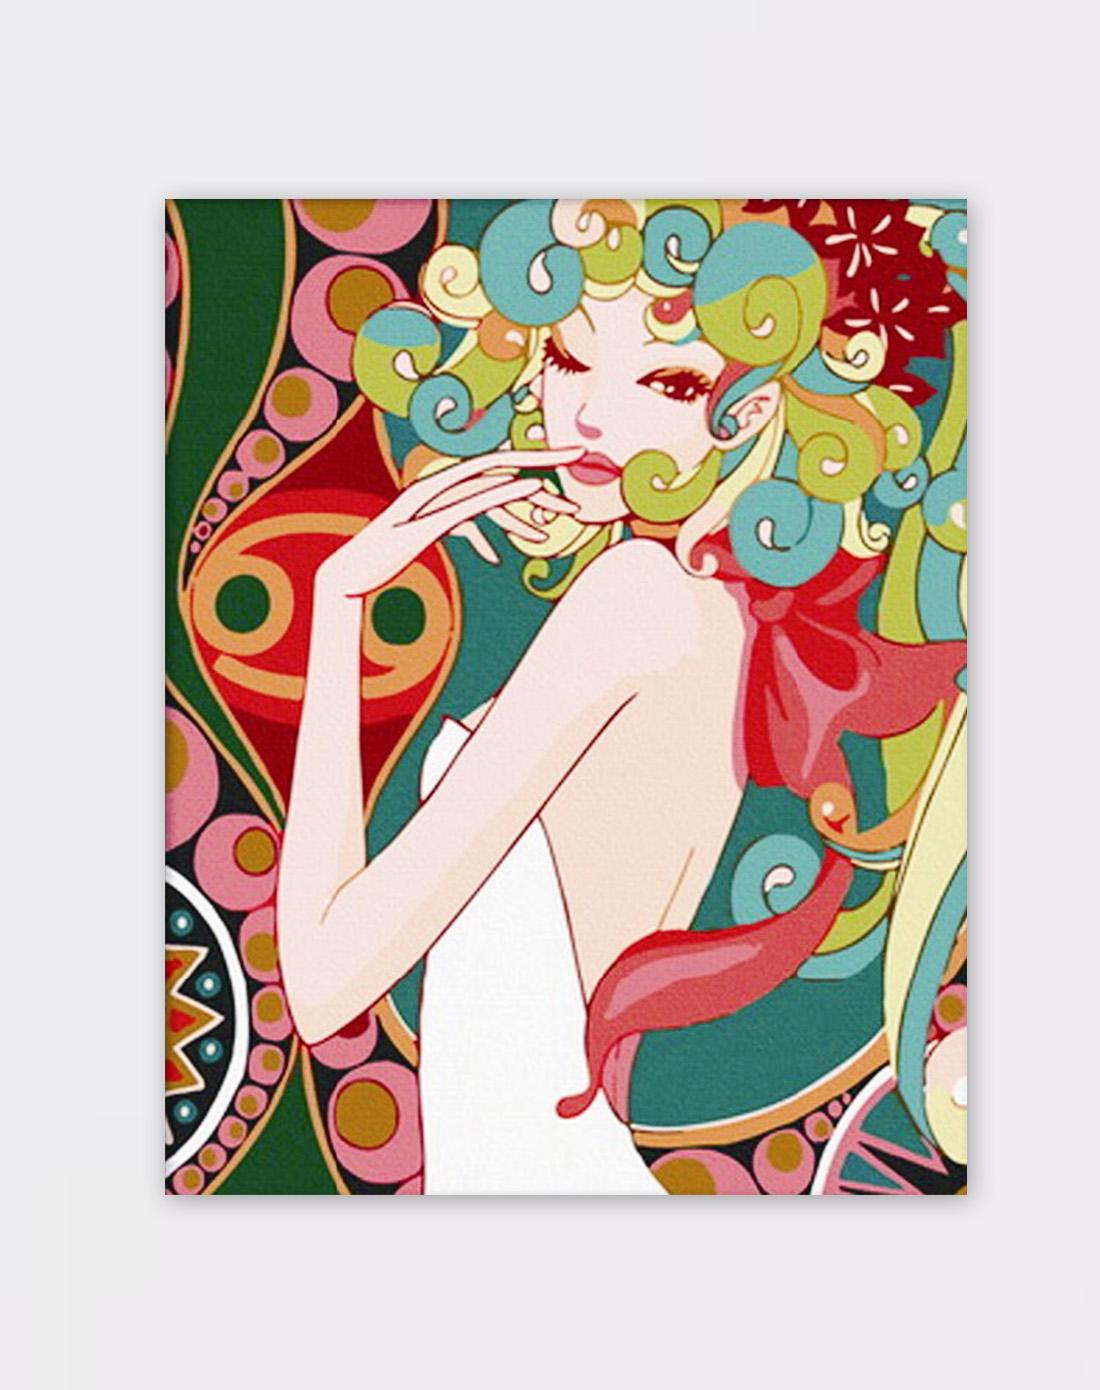 diy手绘数字油画-时尚小娇娃